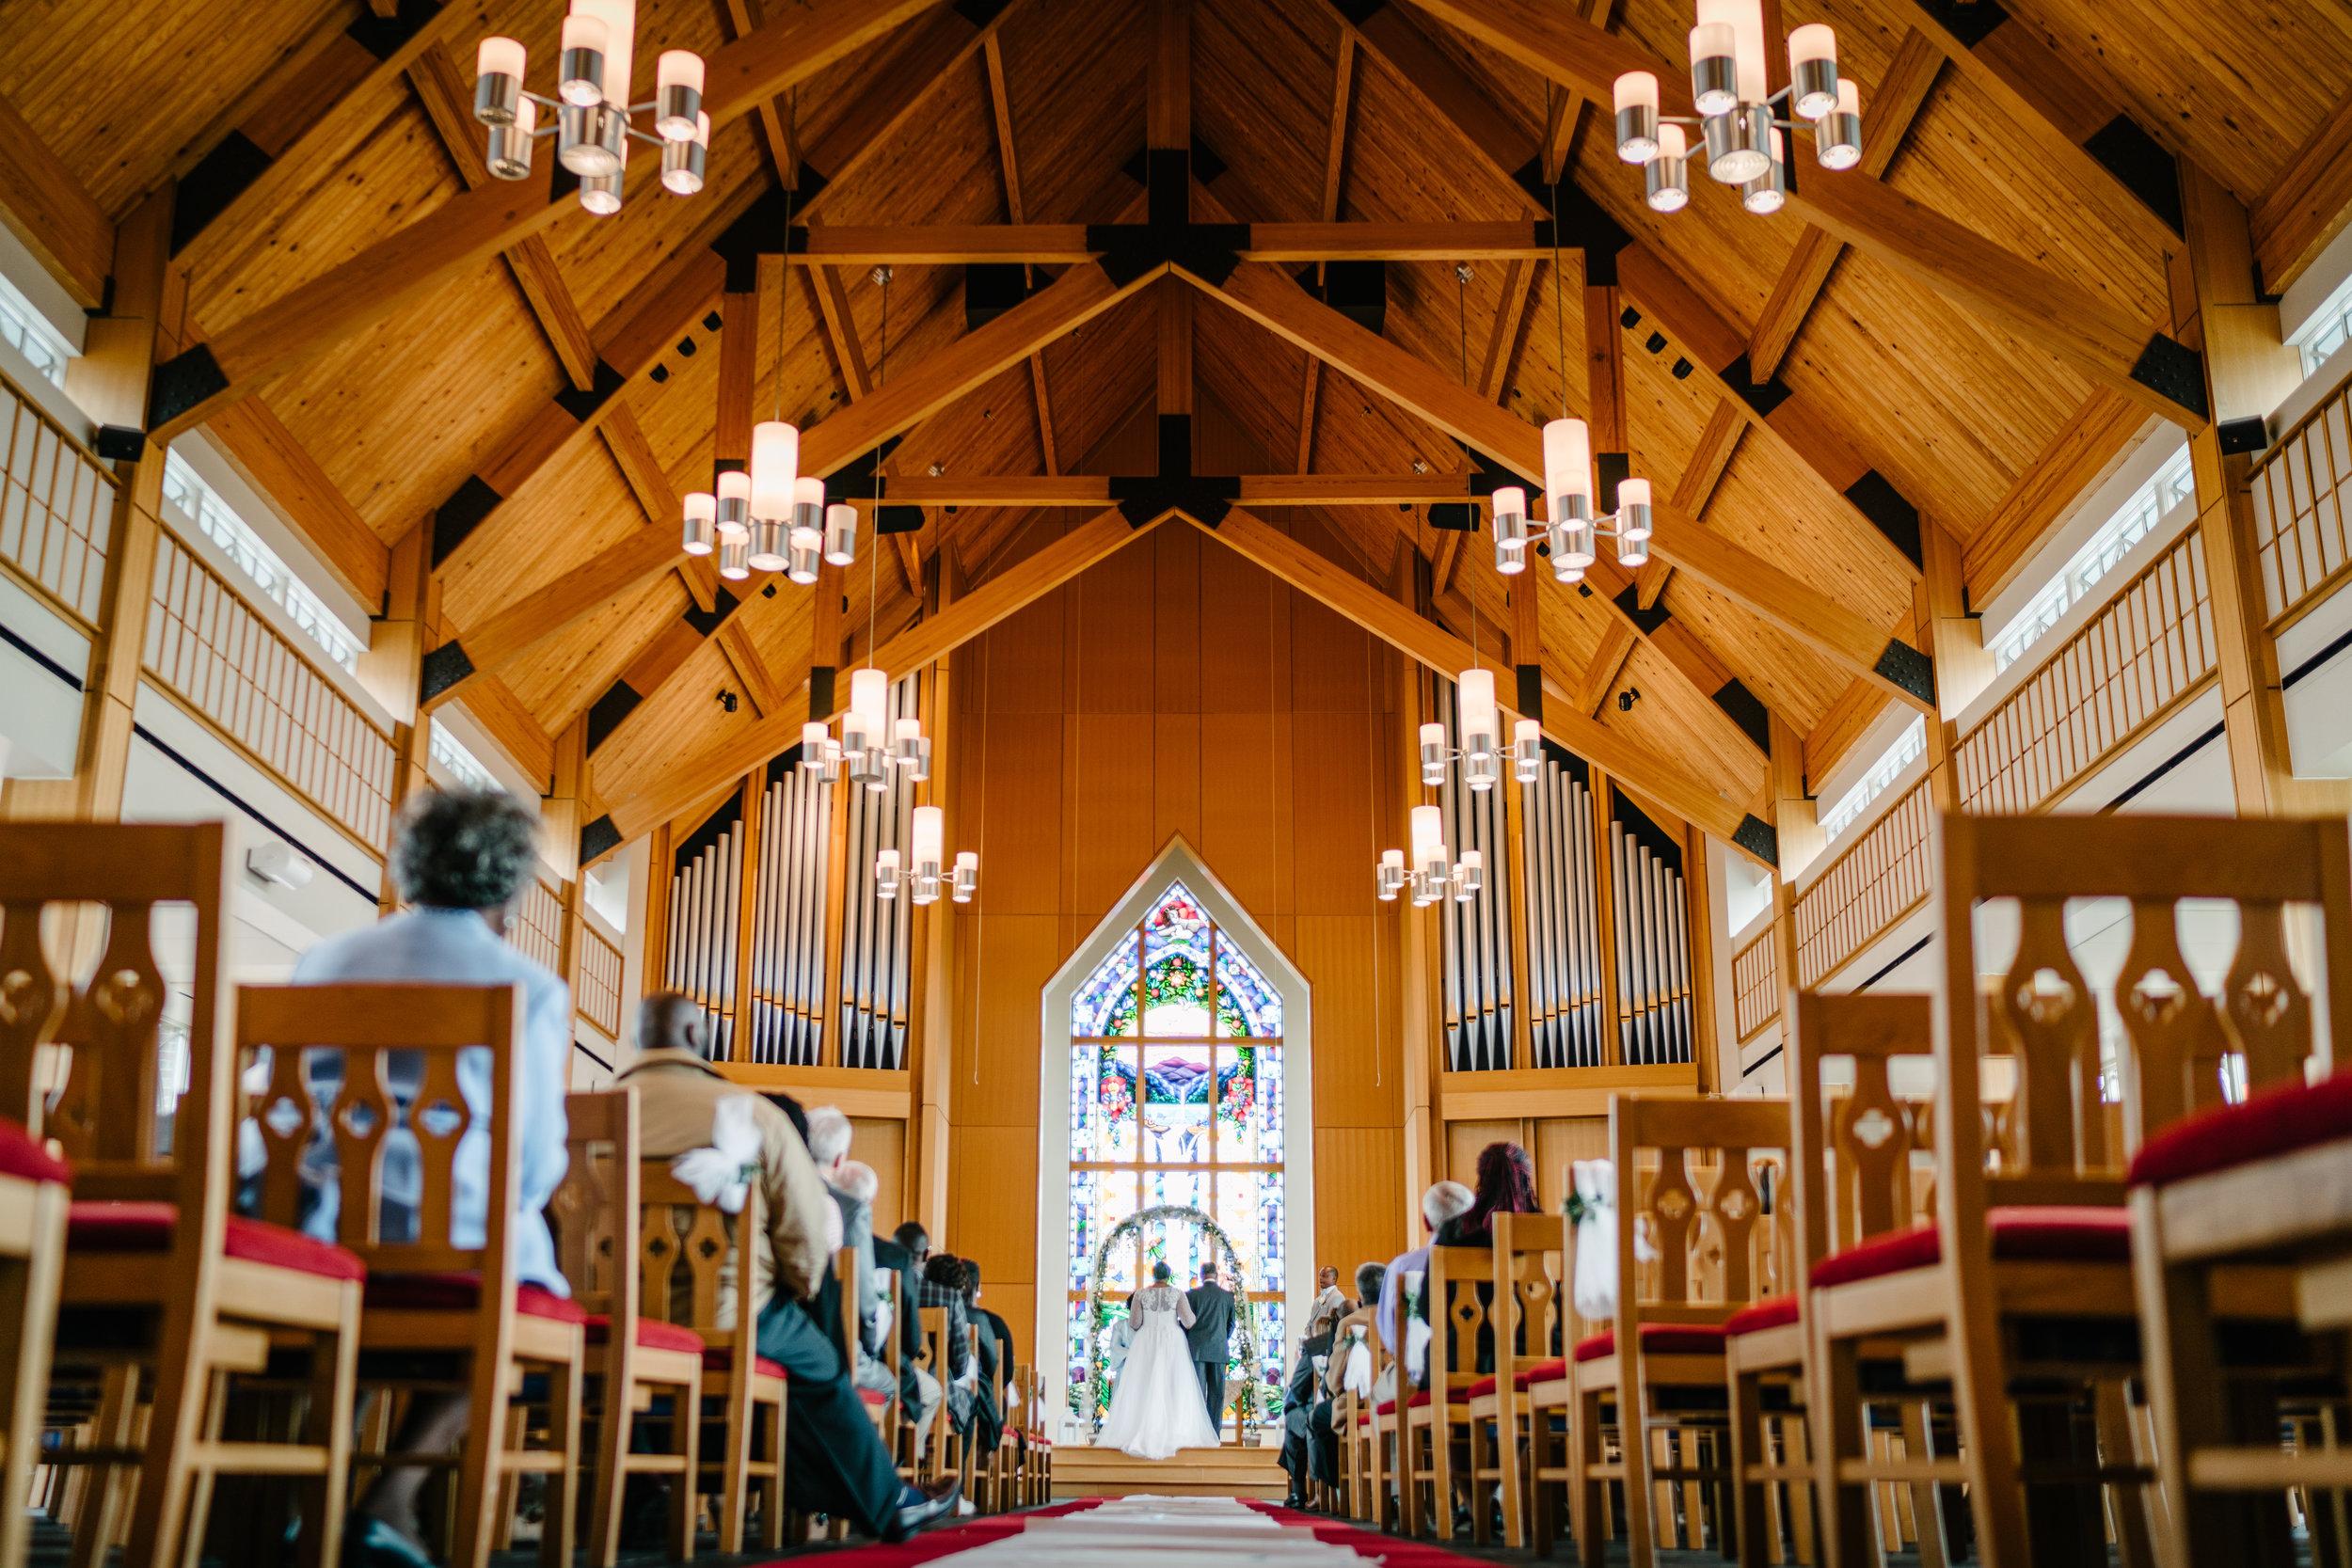 Wedding_PortMacyWeddingAlbum2017-7-45.jpg